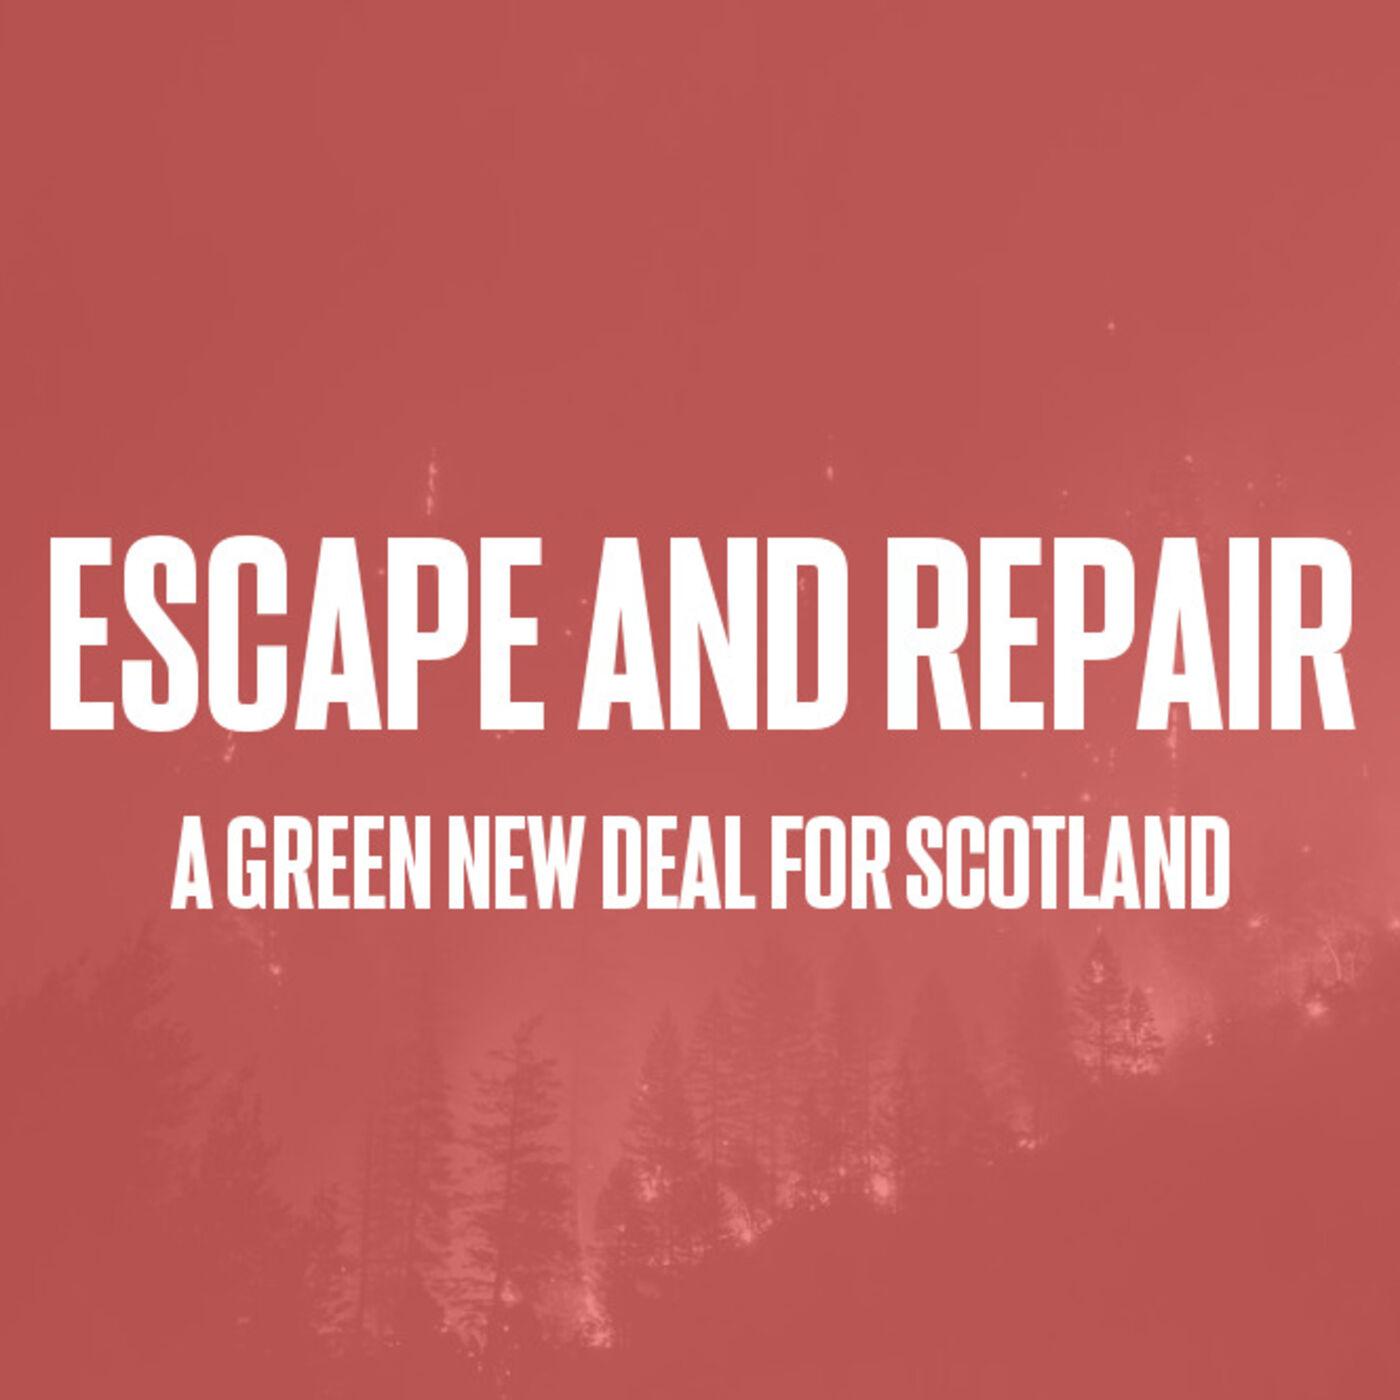 Episode #21 - Escape and Repair